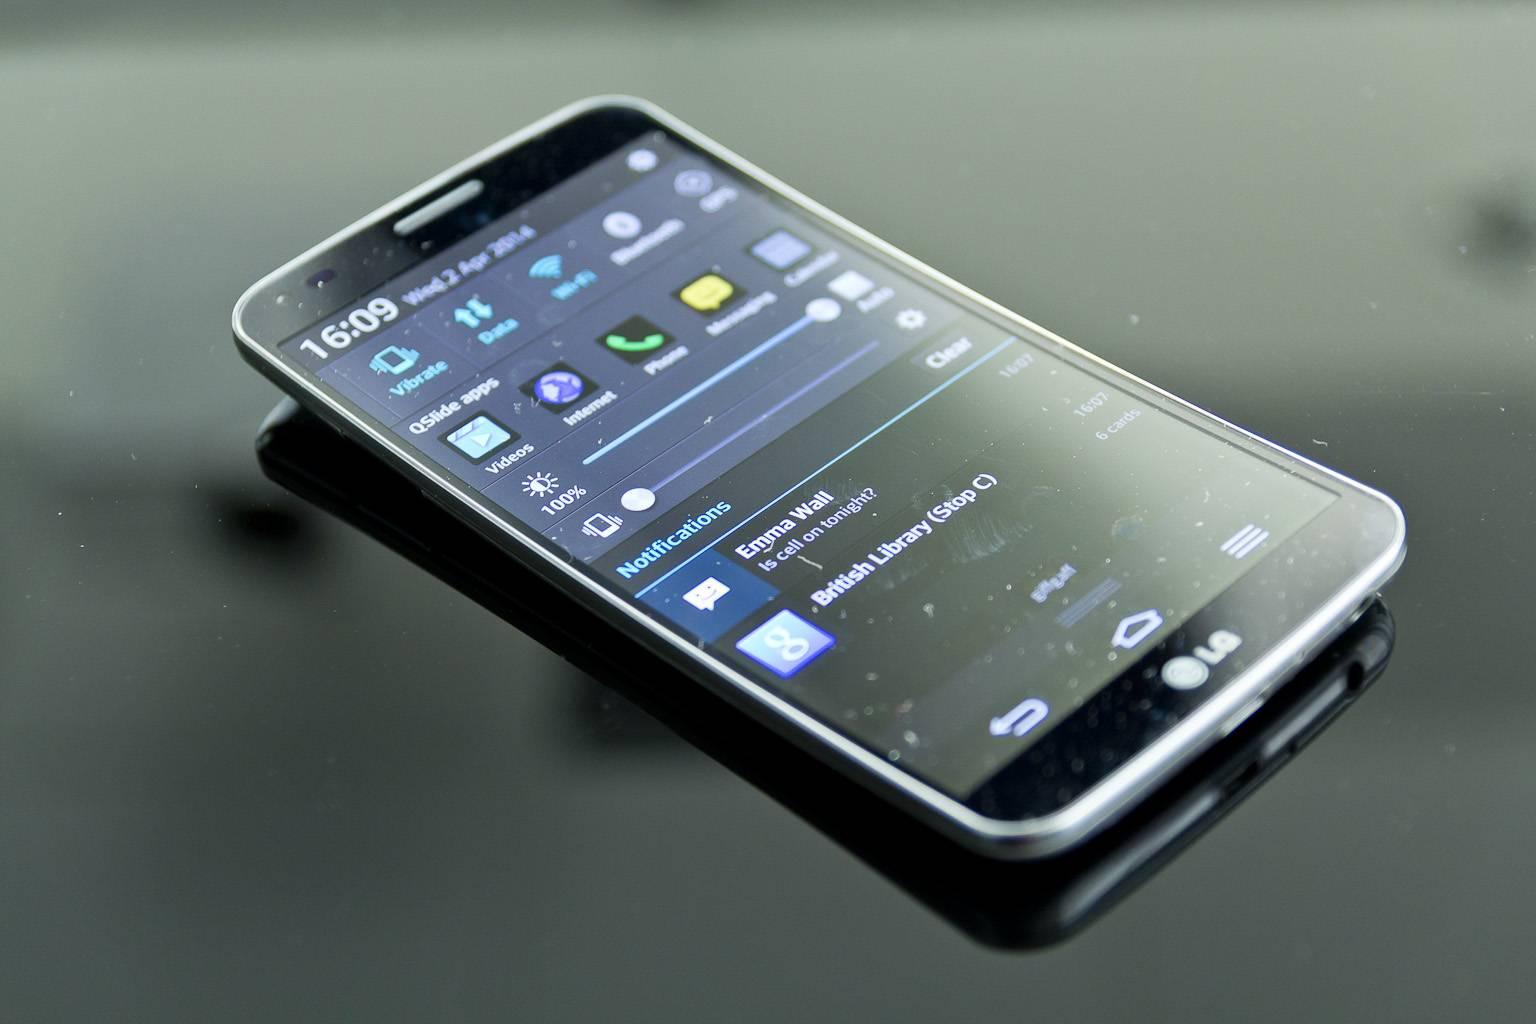 LG G Flex 2 to hit market next week, finally - Android Community